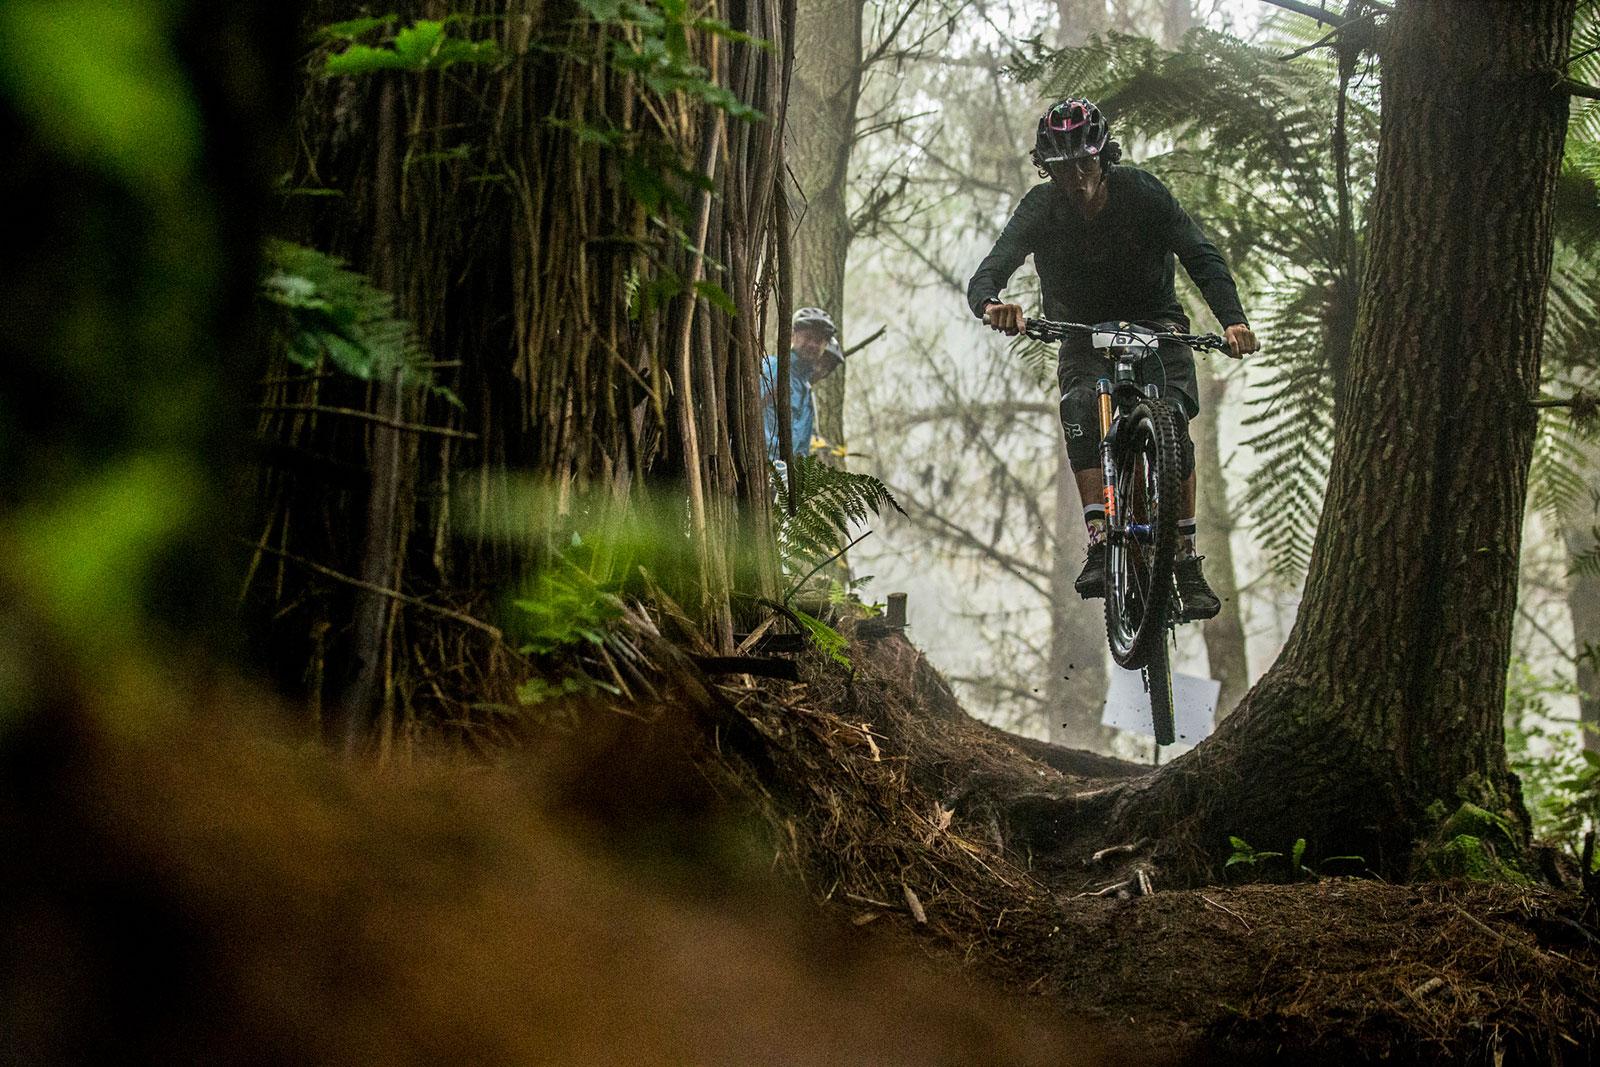 Santa Cruz Bicycles Racer Josh Bryceland at the 2017 Rotorua Enduro World Series